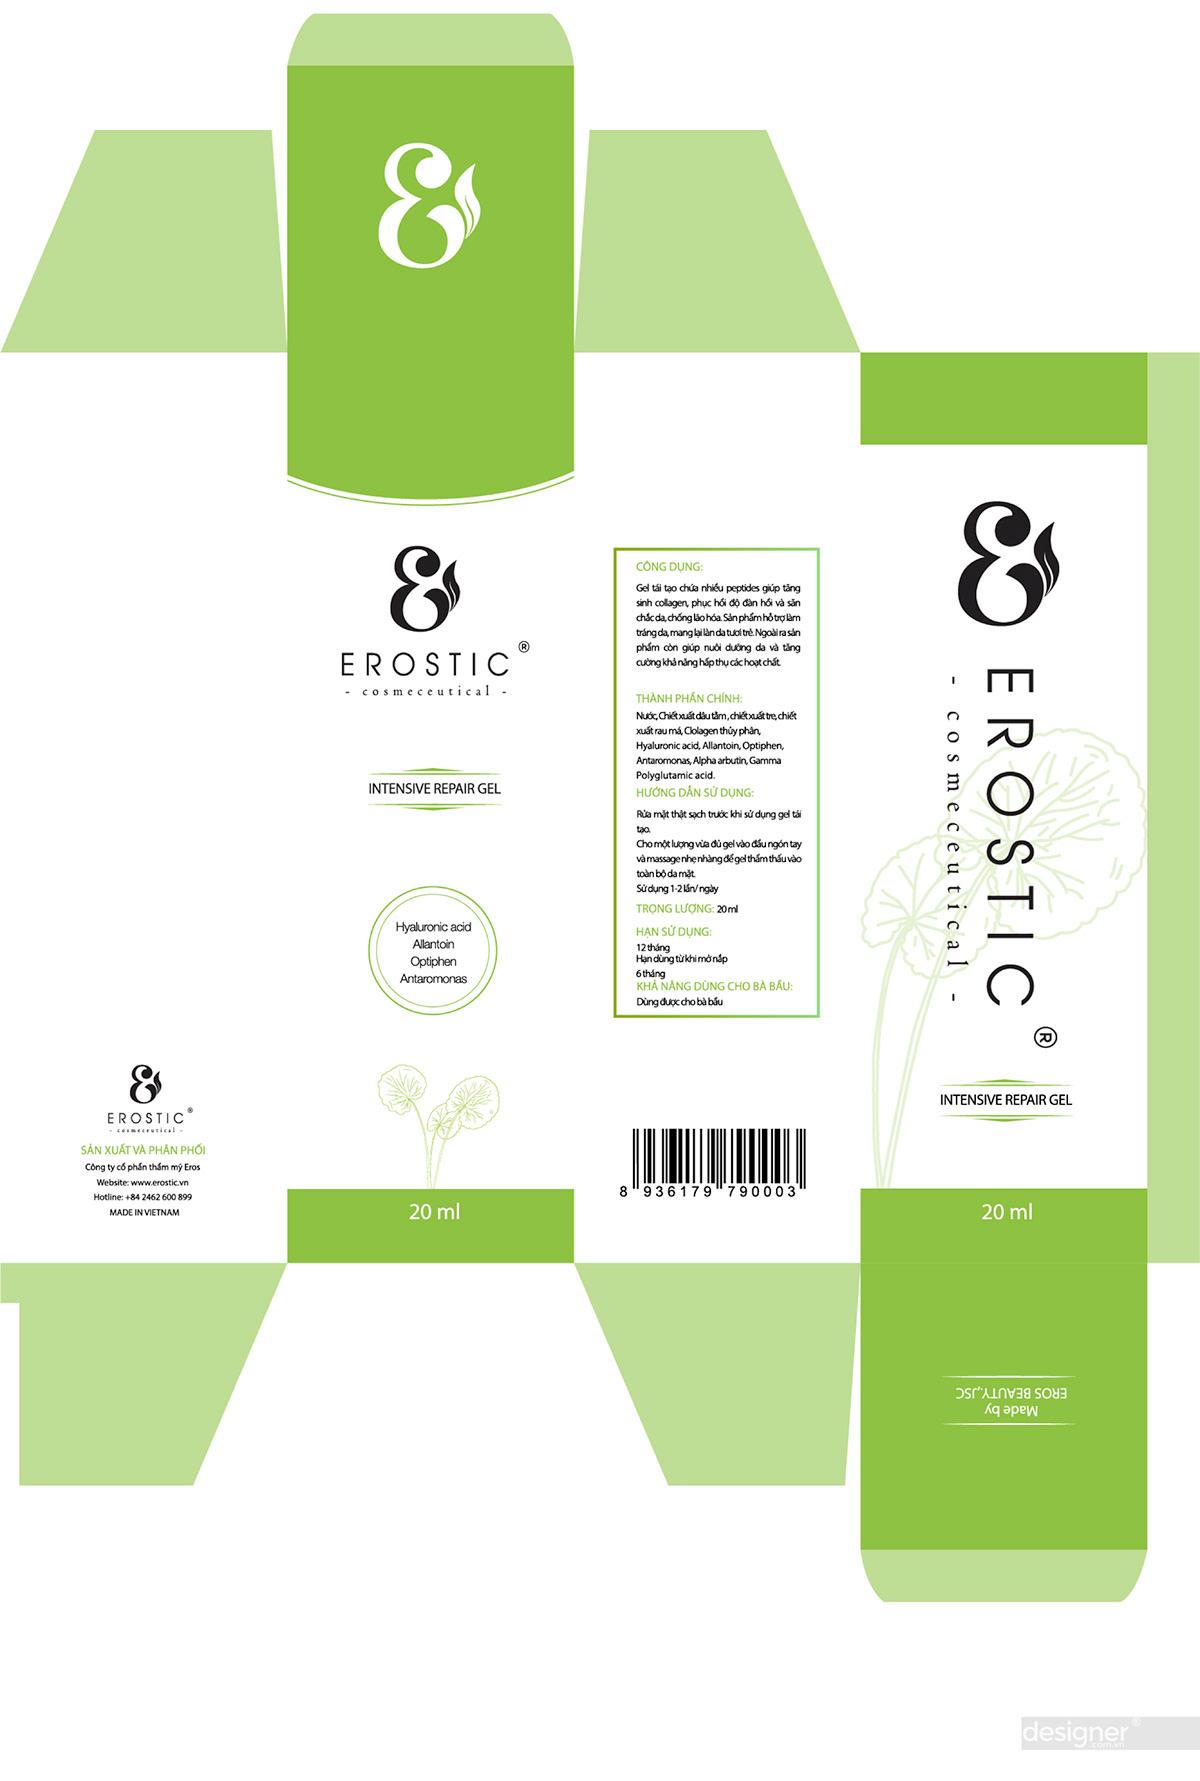 Thiết kế vỏ hộp Erostic